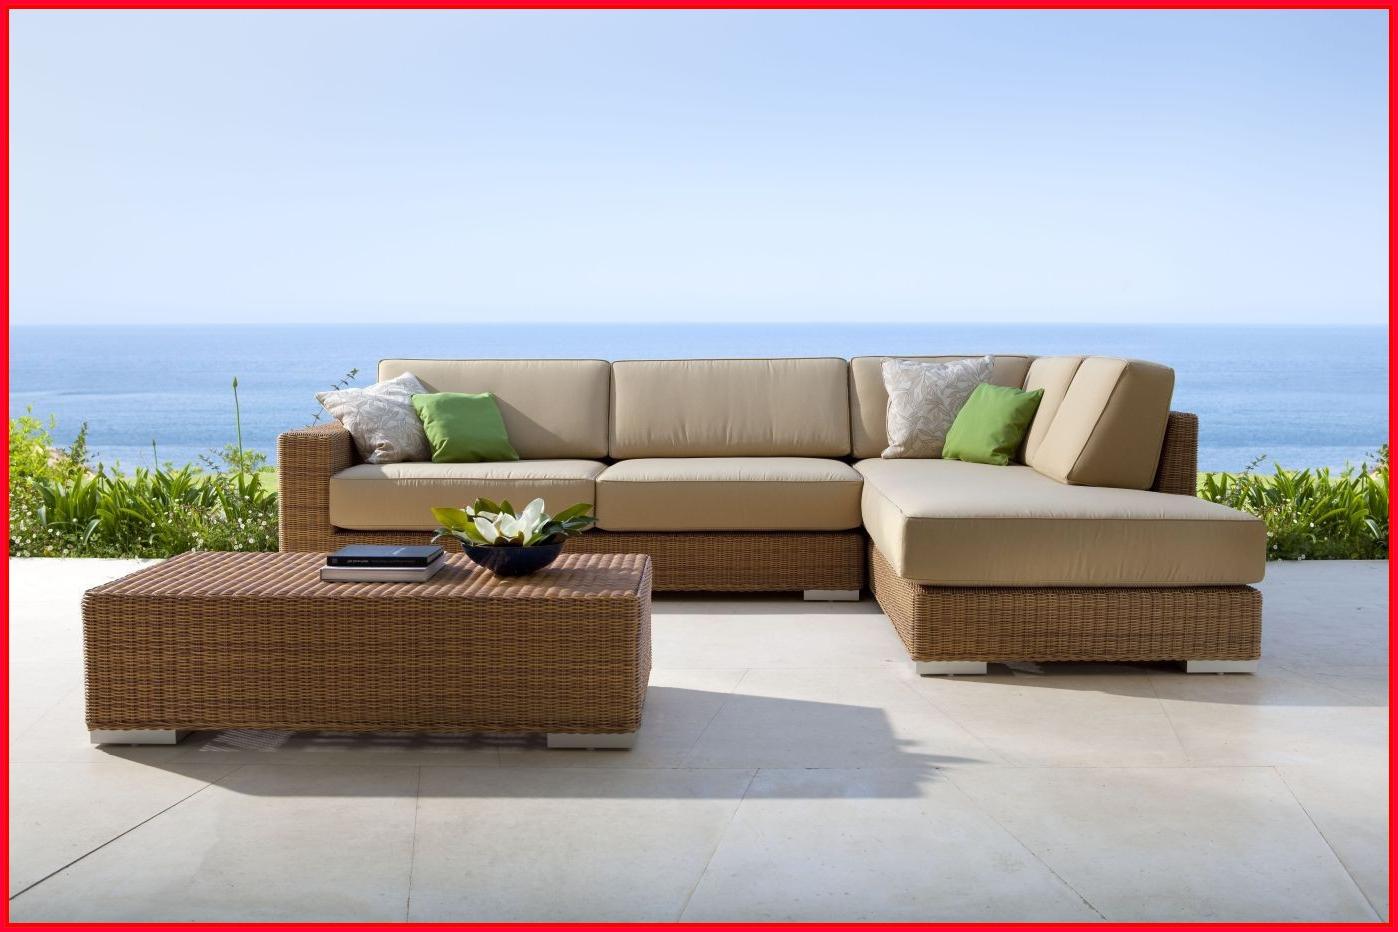 Sillones Para Terrazas Mndw Sillones De Jardin Baratos Muebles Para Terraza Exterior